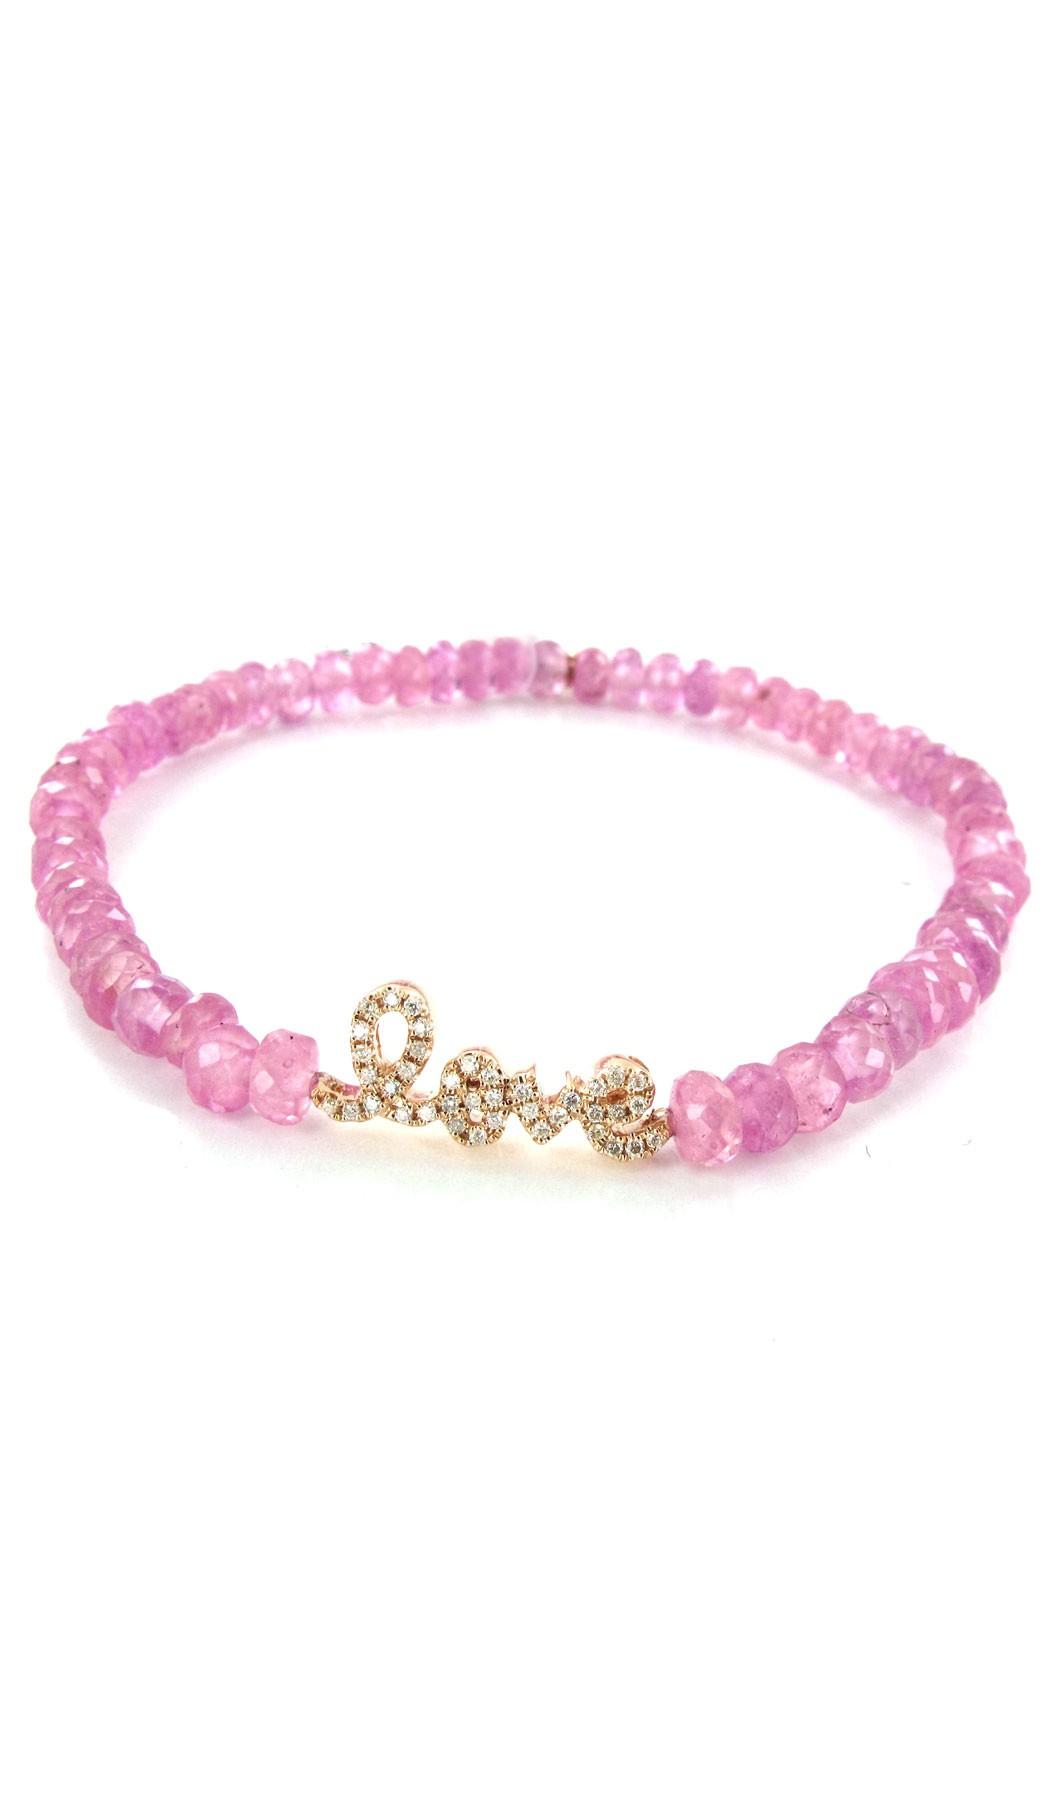 Sydney evan pink sapphire bracelet love